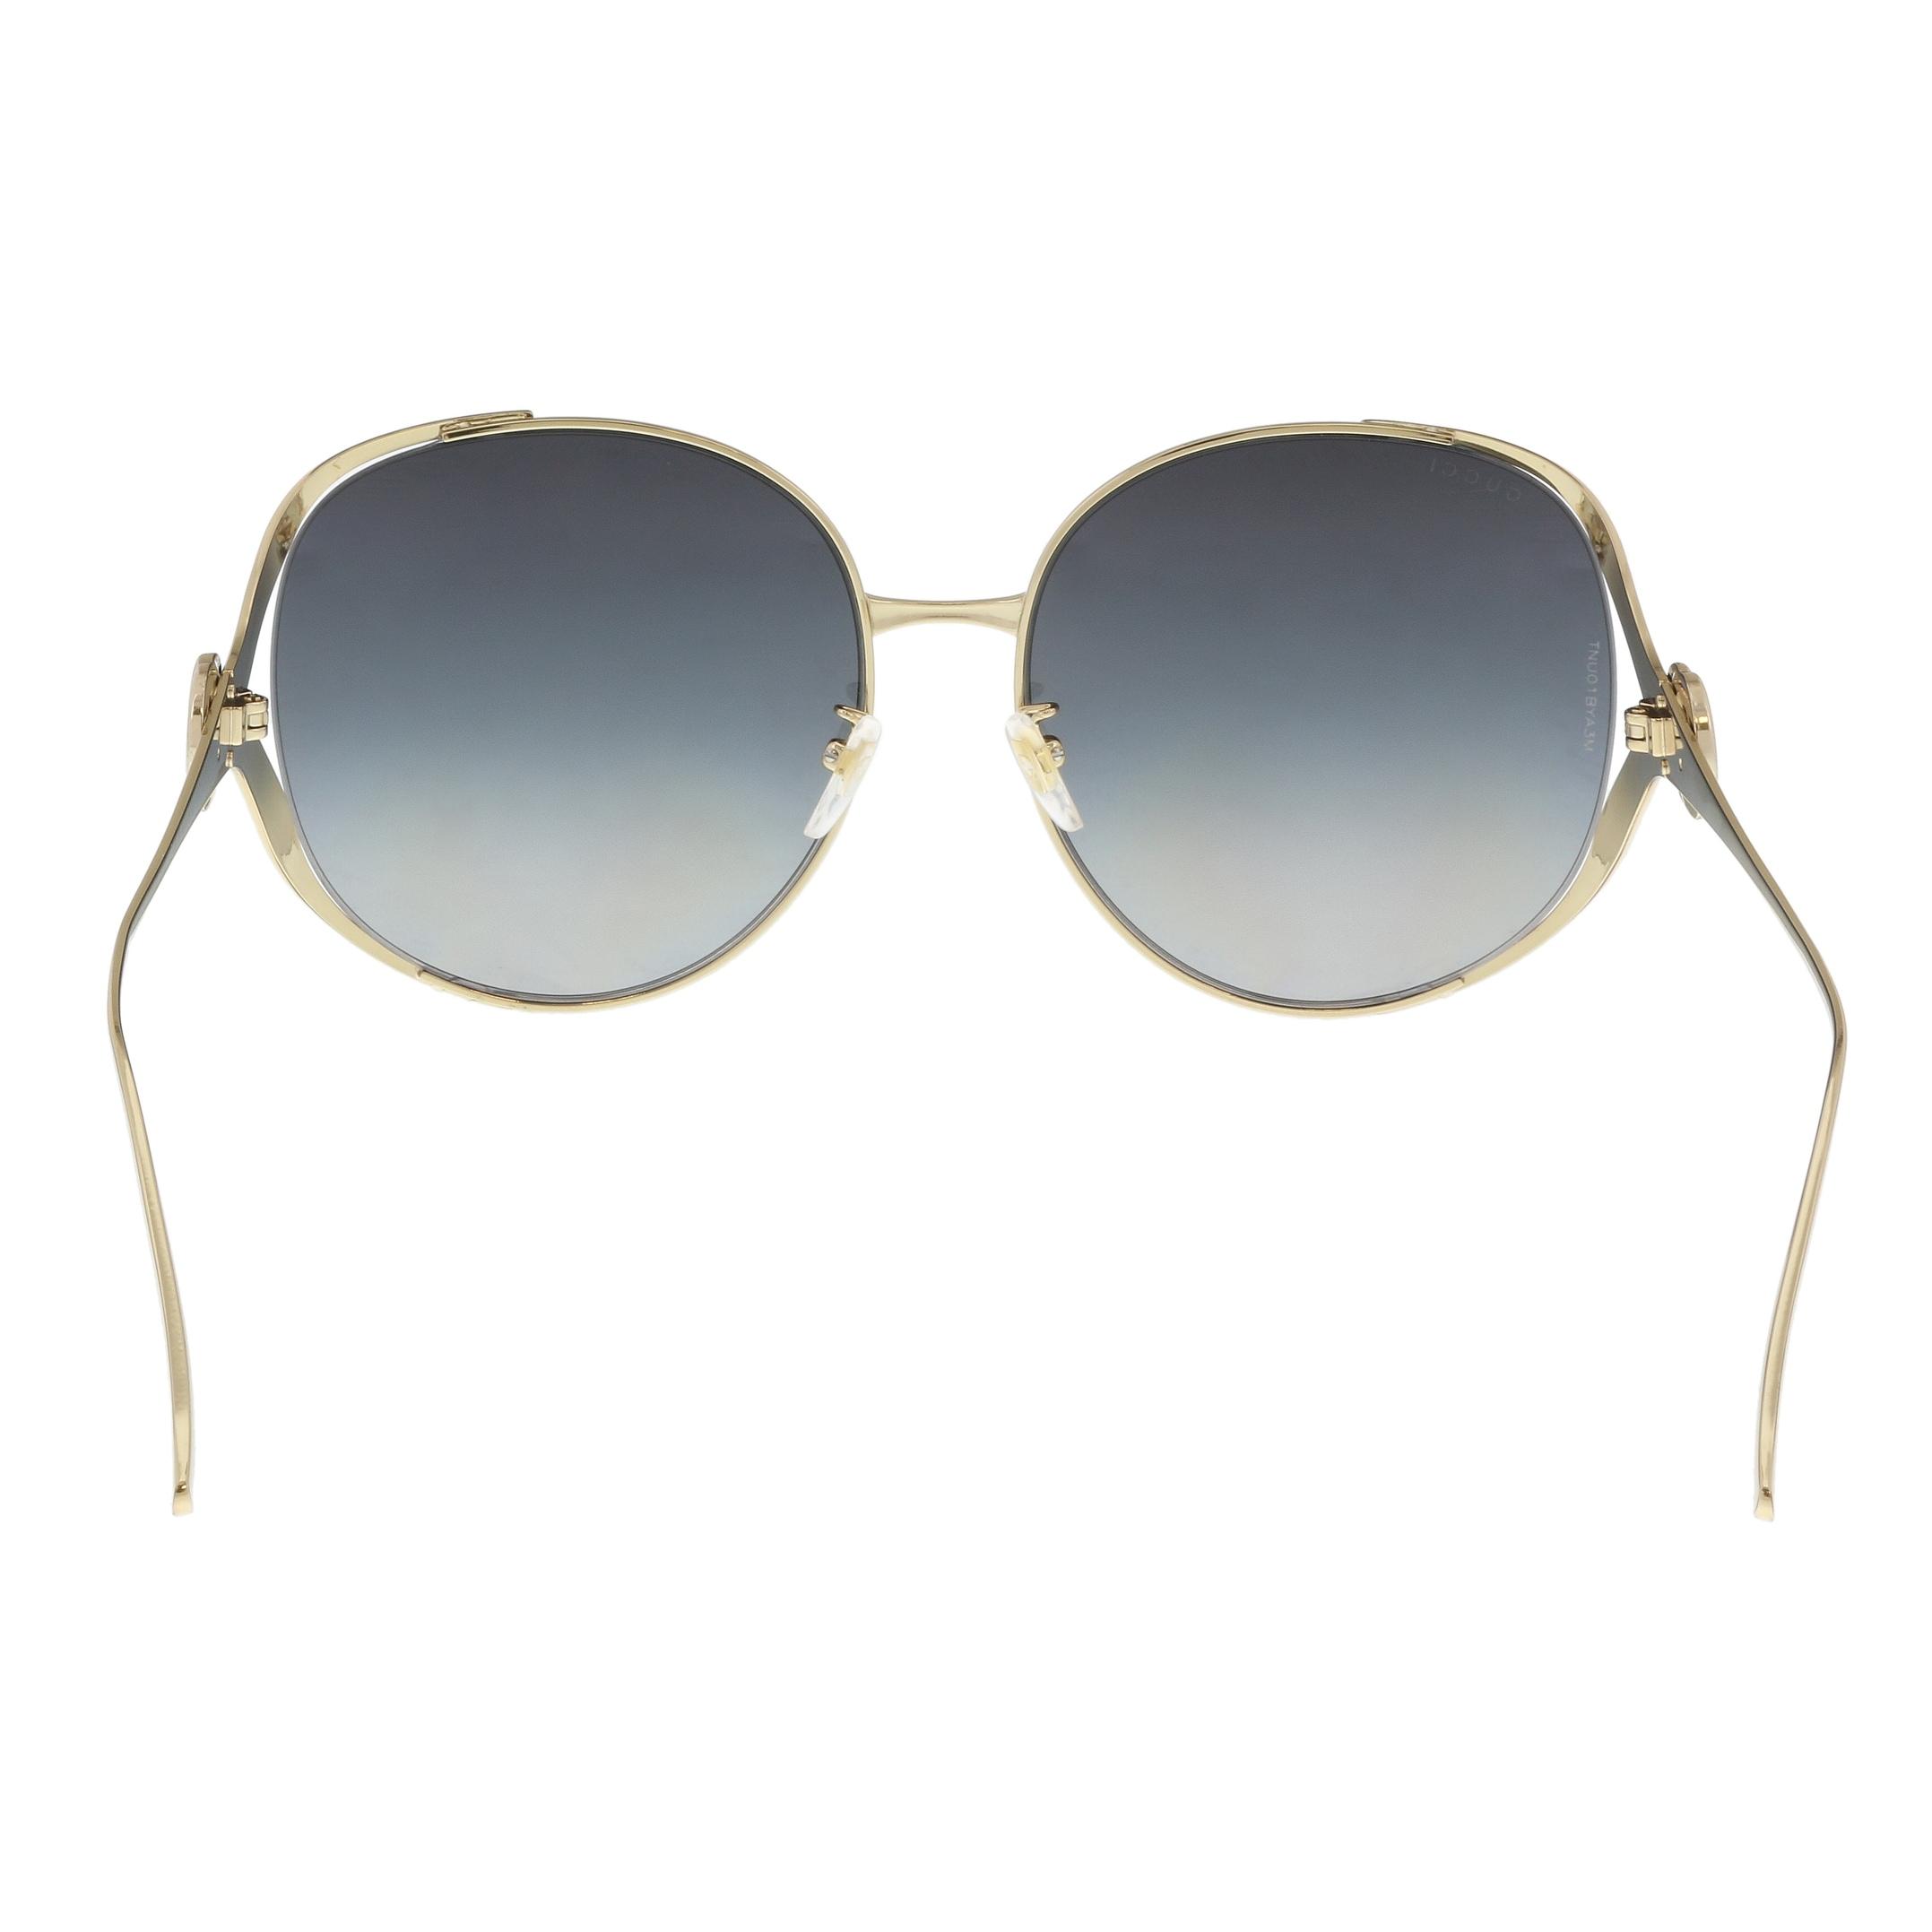 f91ad01e642 Shop Gucci GG0225S-001 Gold Square Sunglasses - 63-17-130 - Free Shipping  Today - Overstock - 21157987